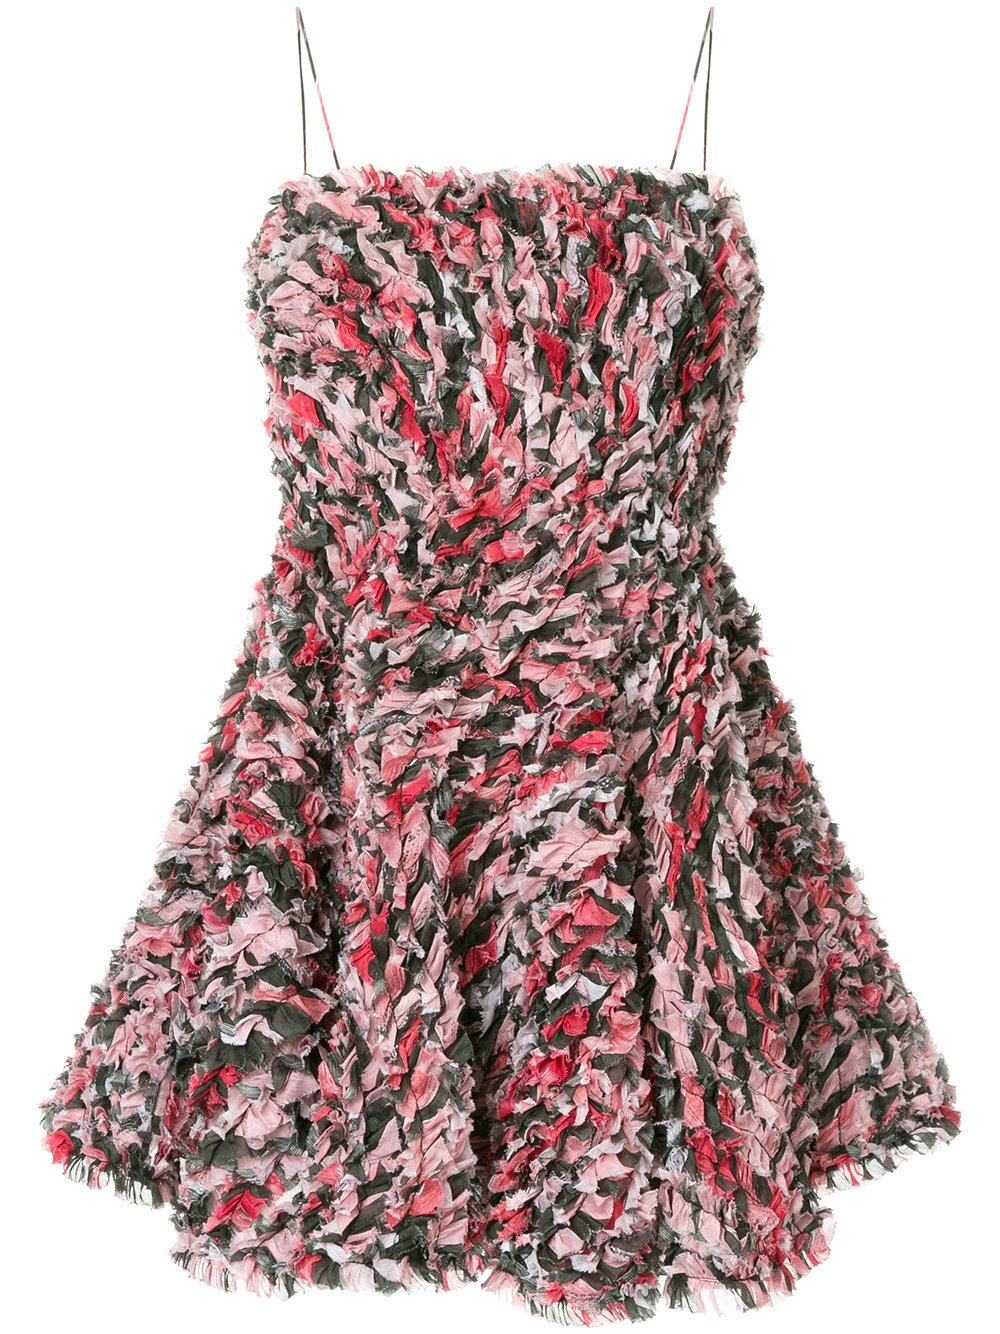 Aje Grevillea Textured Mini Dress - Pink In Pink & Purple